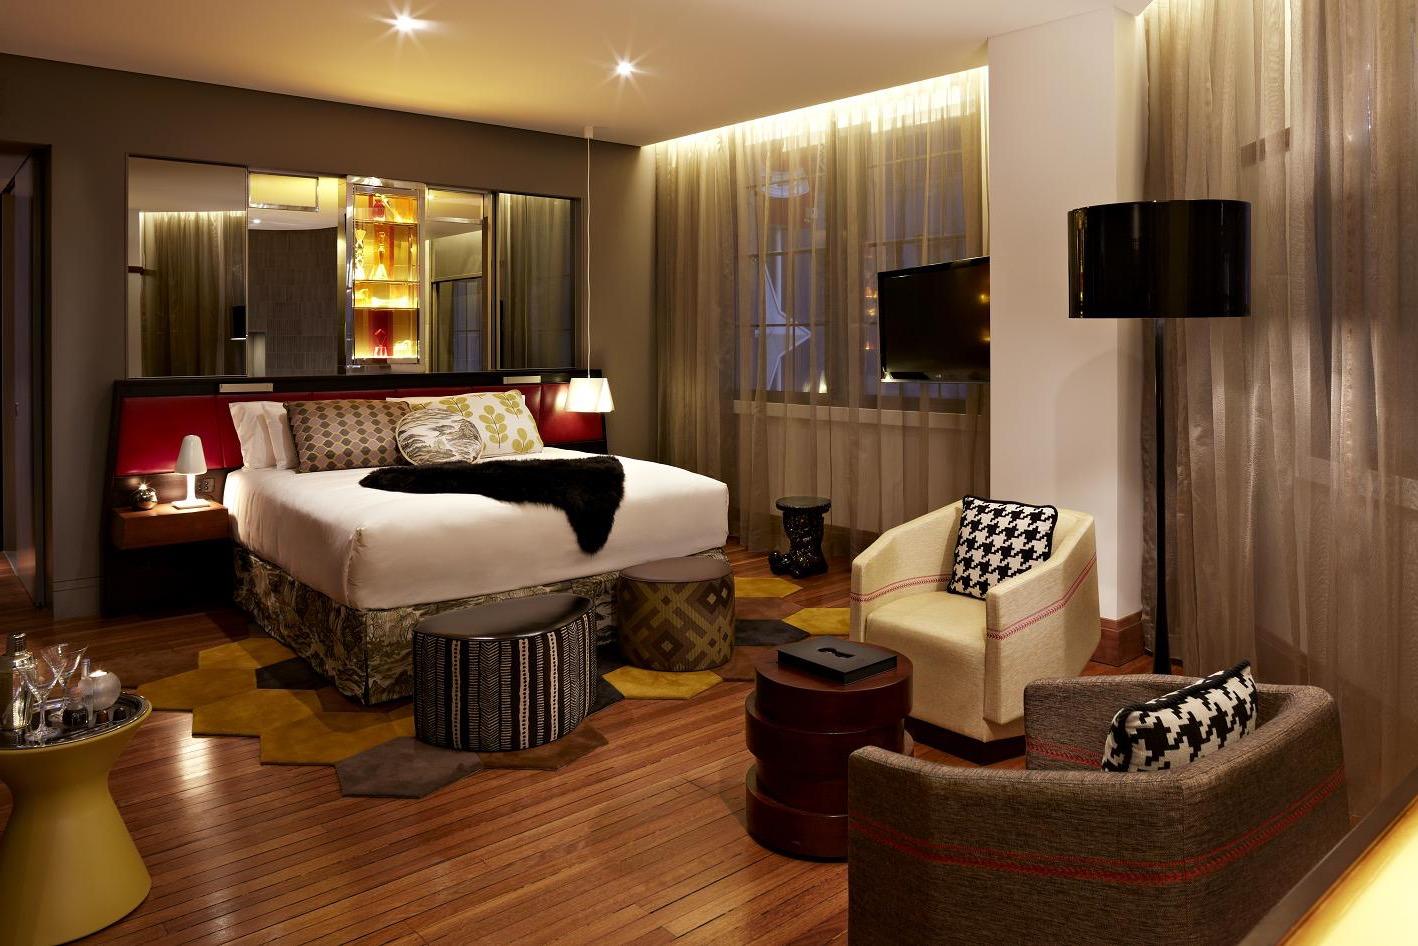 Art Deco Lighting Decor For Contemporary Bedroom (View 6 of 13)